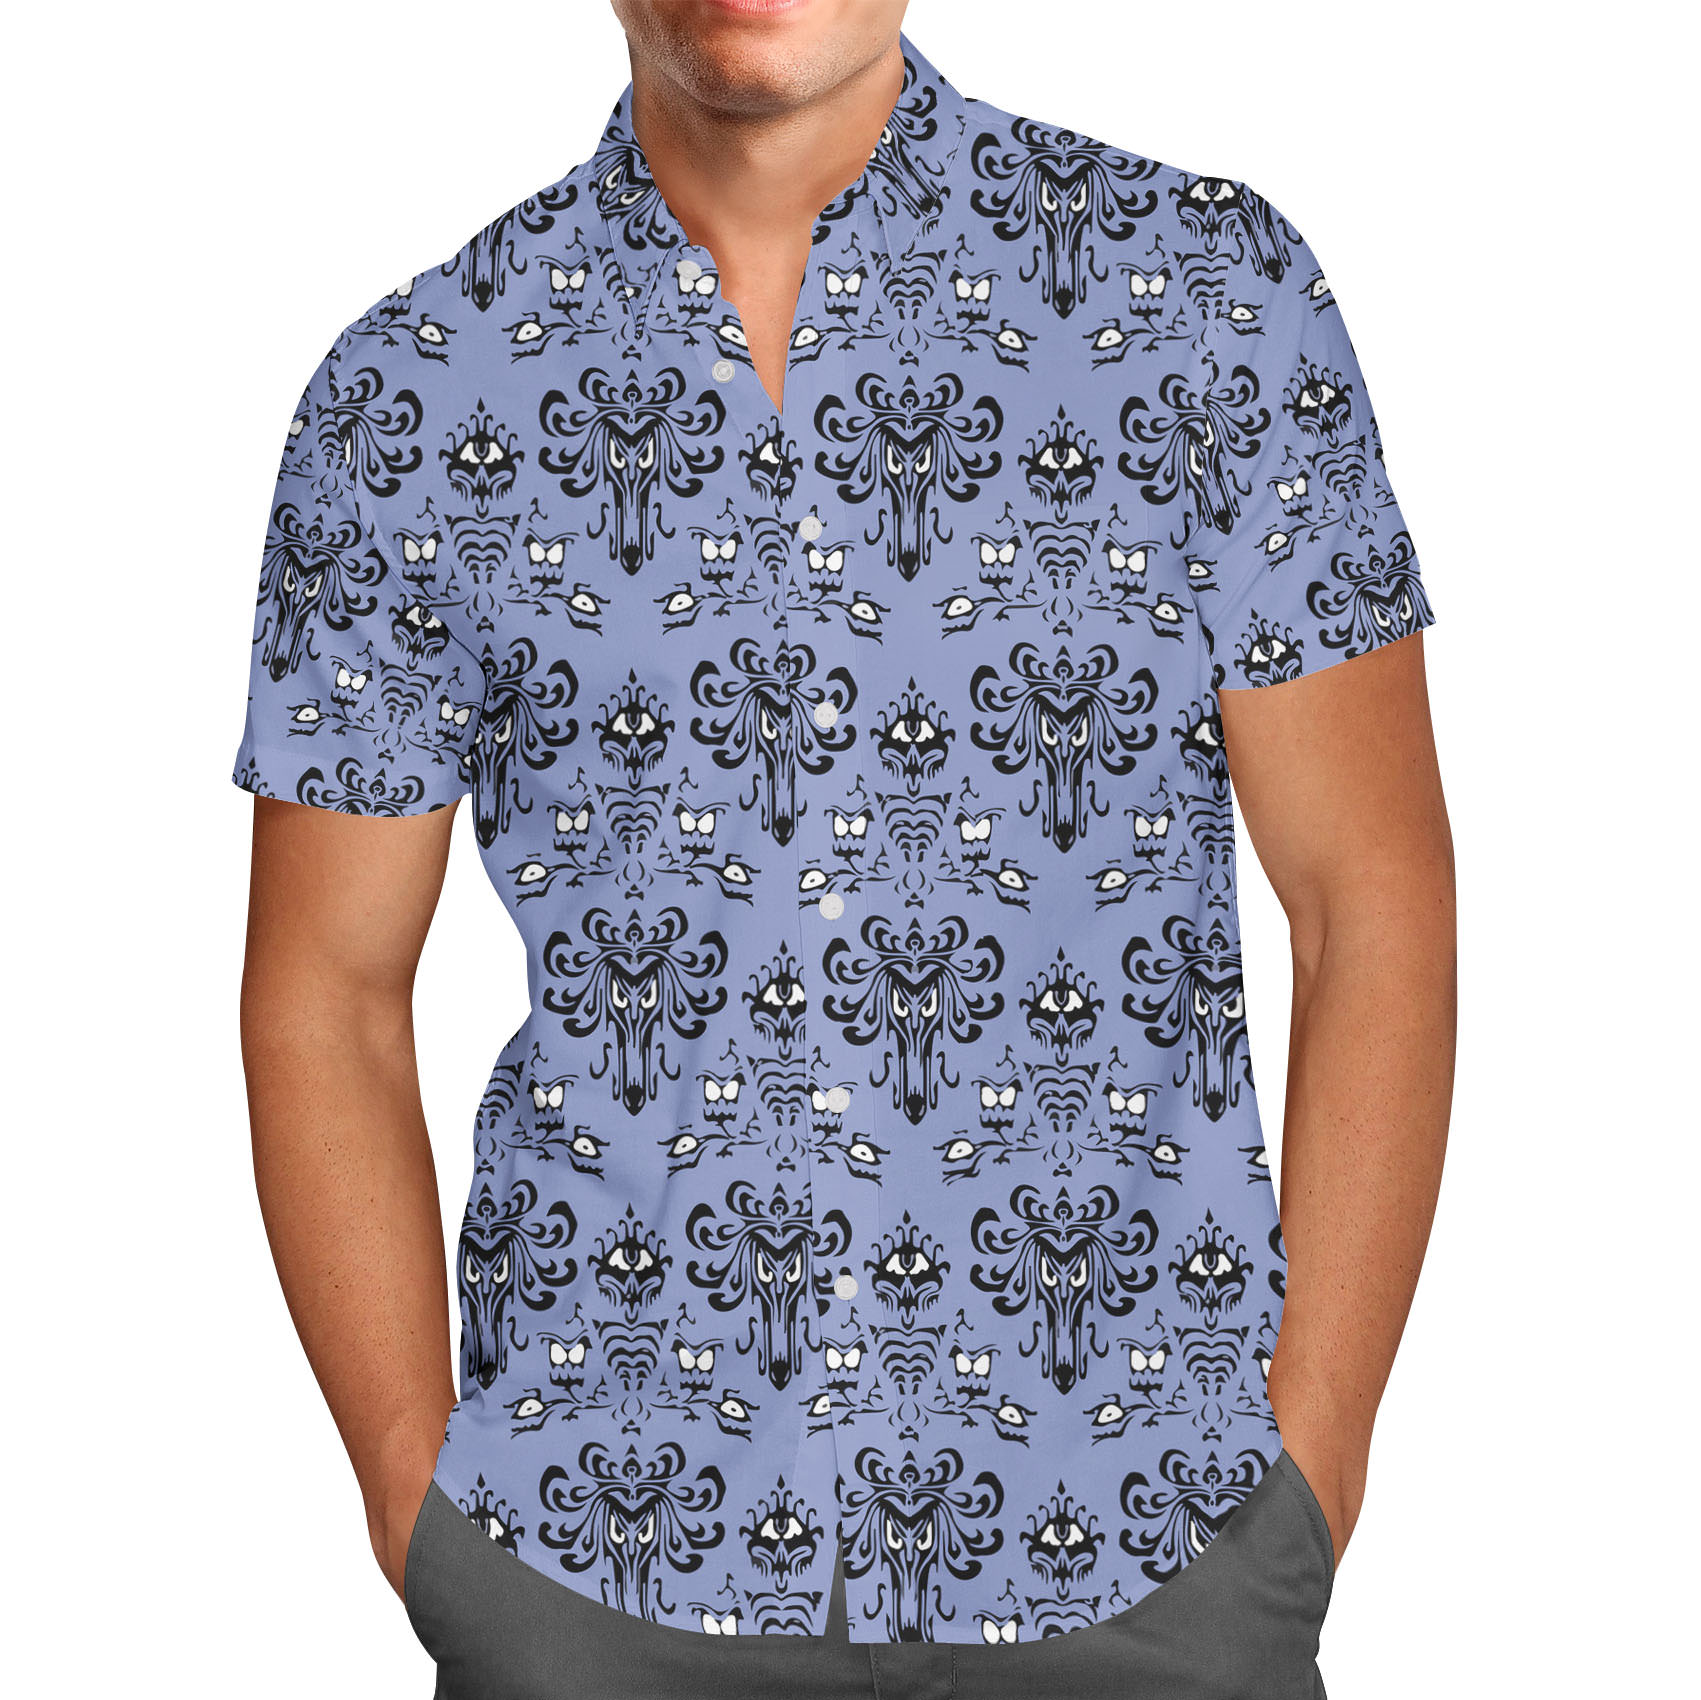 Men's Button Down Short Sleeve Shirt - Haunted Mansion Wallpaper